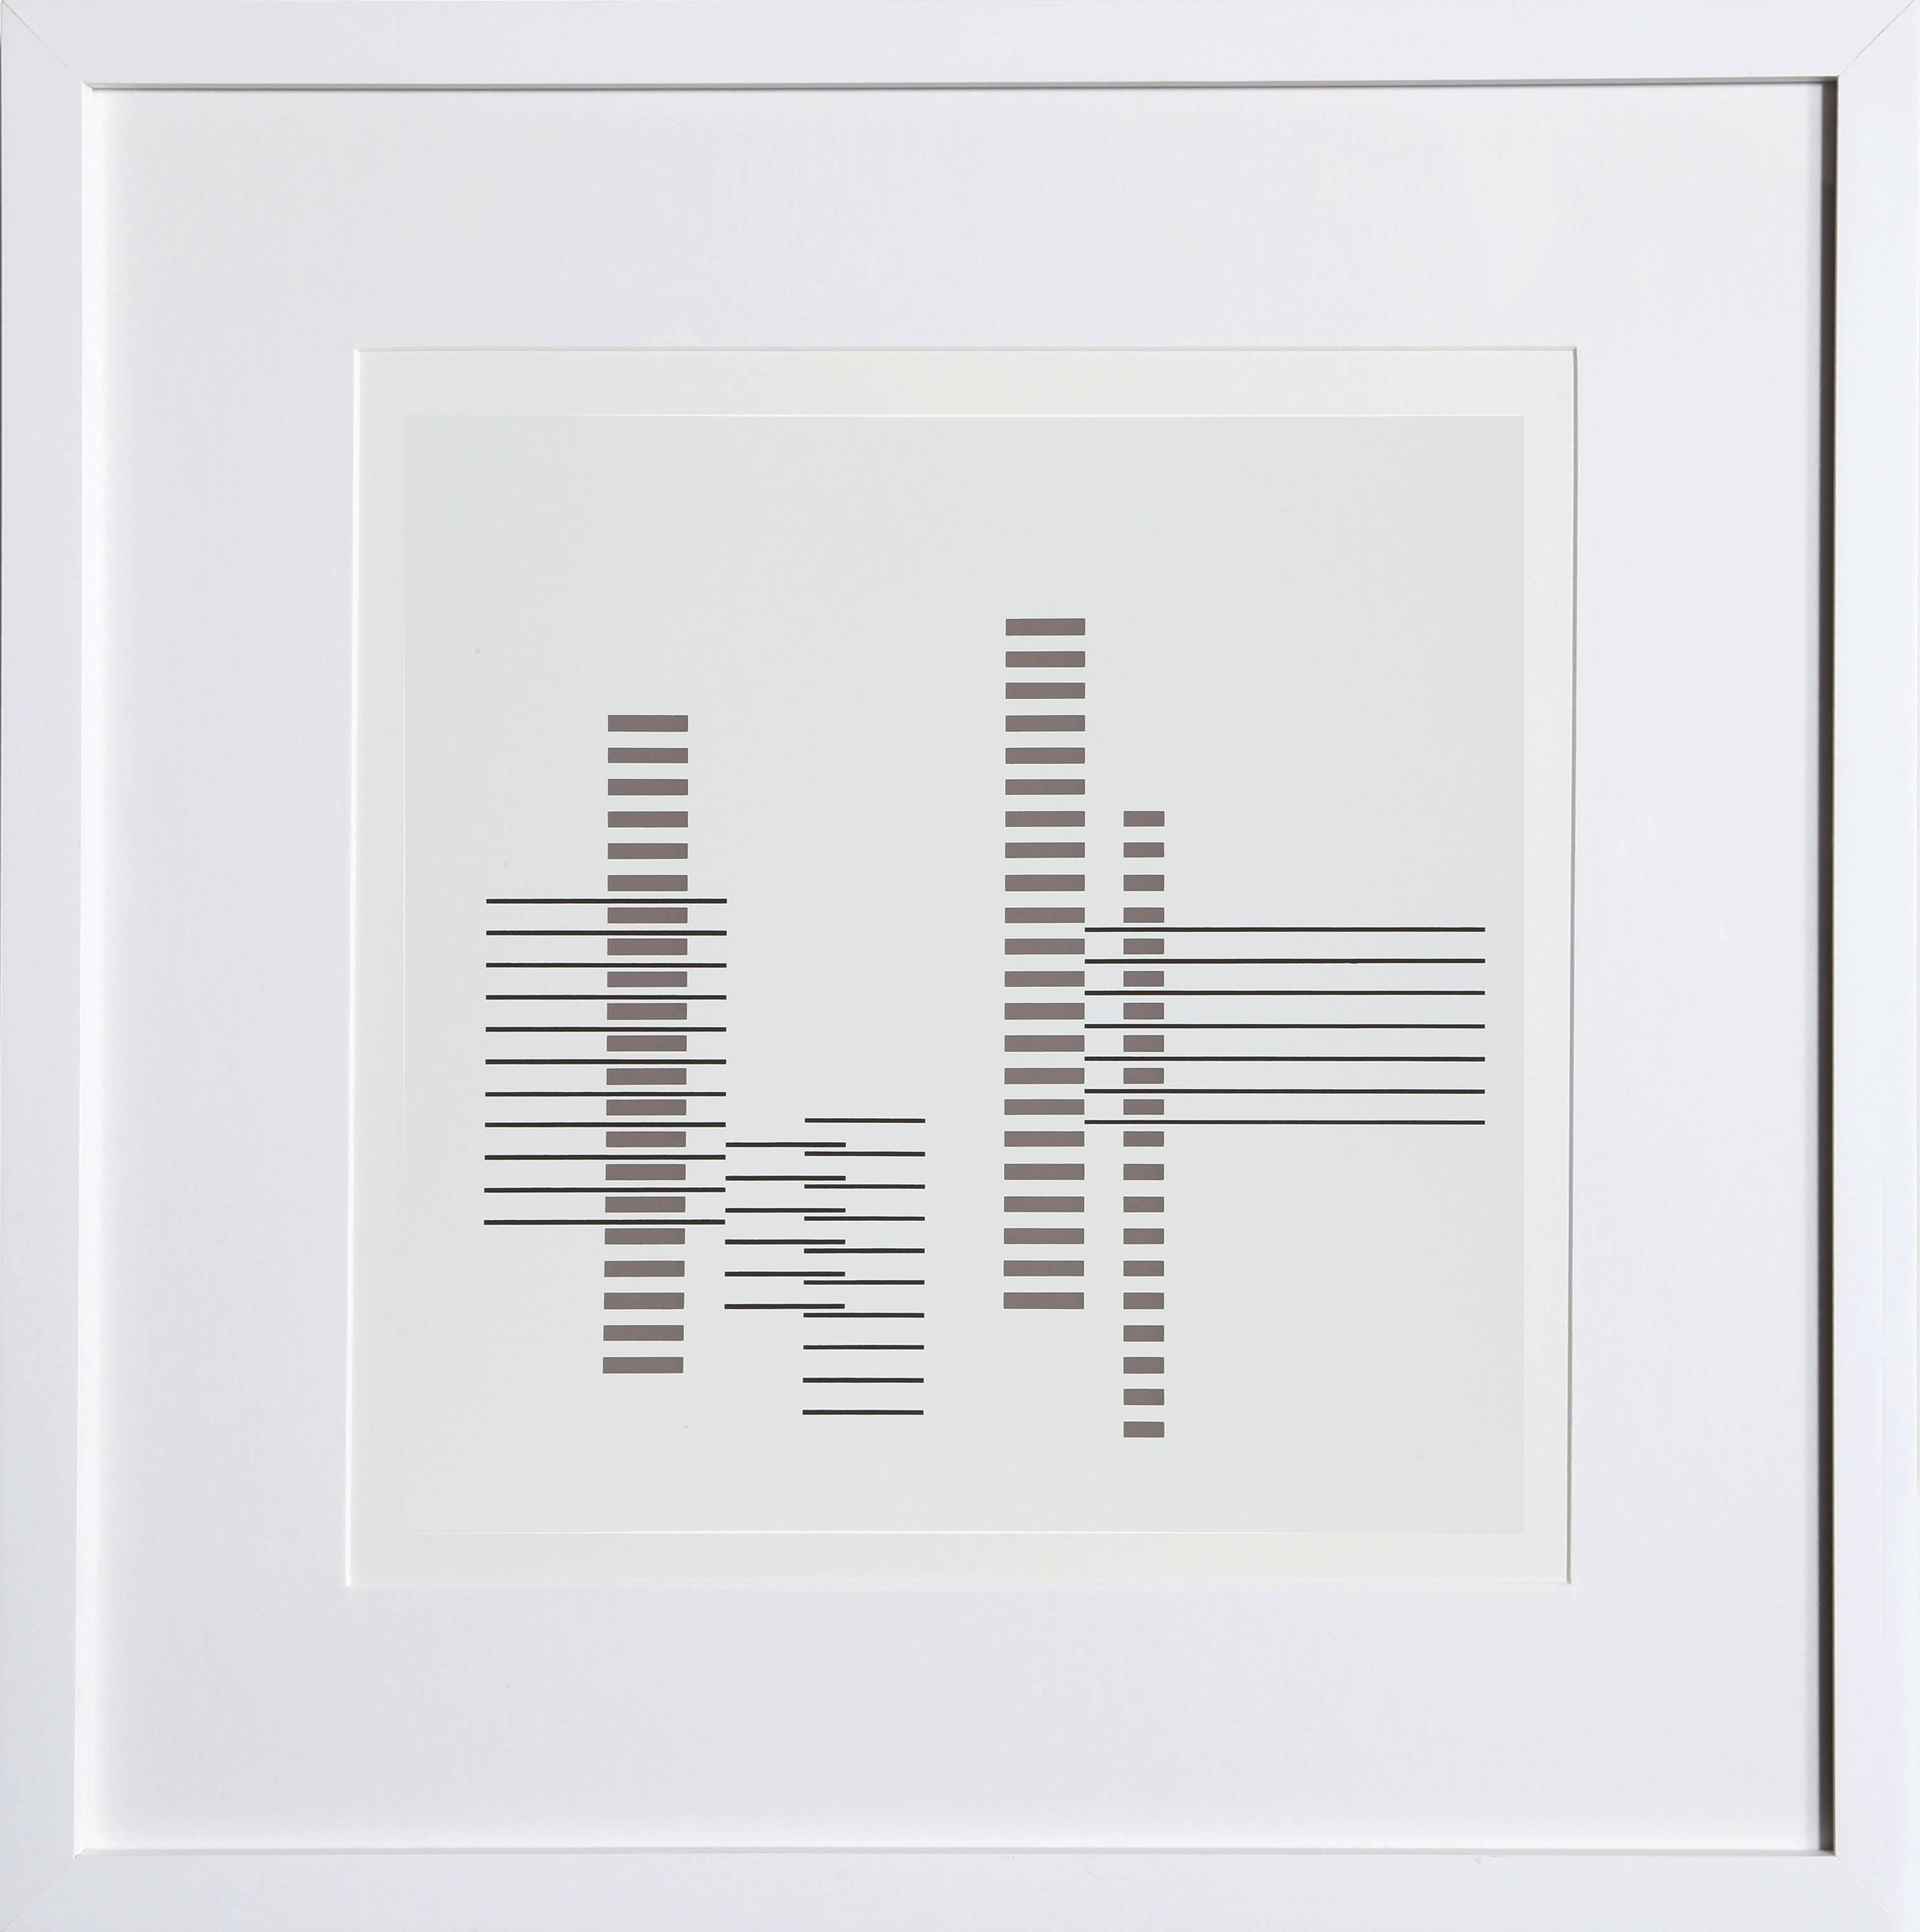 Minimalist Geometric Abstract Silkscreen by Josef Albers 1972